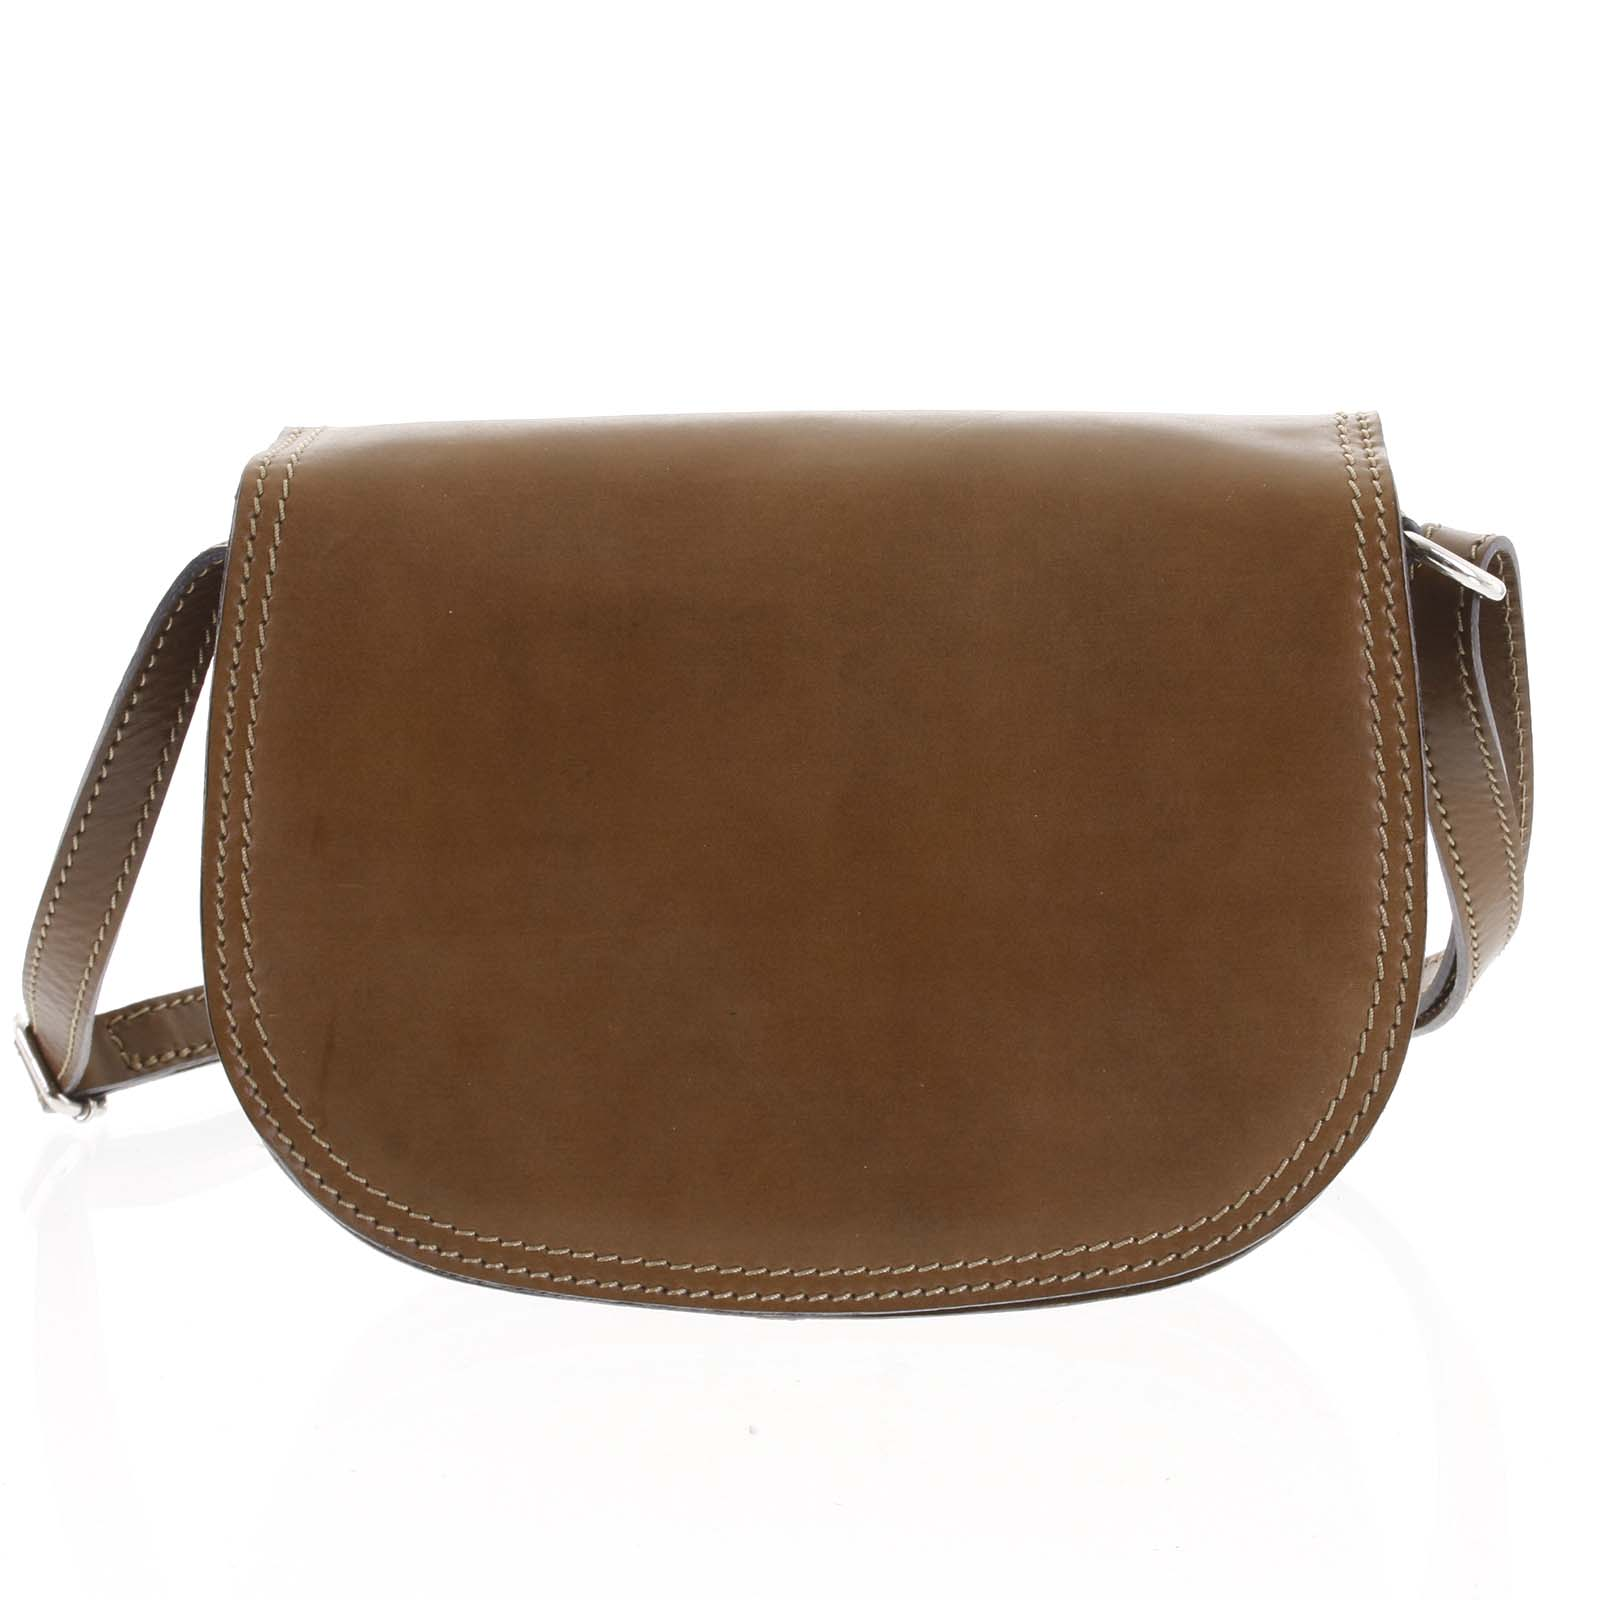 Menšia hnedá lakovaná crossbody kožená kabelka - ItalY Zoya